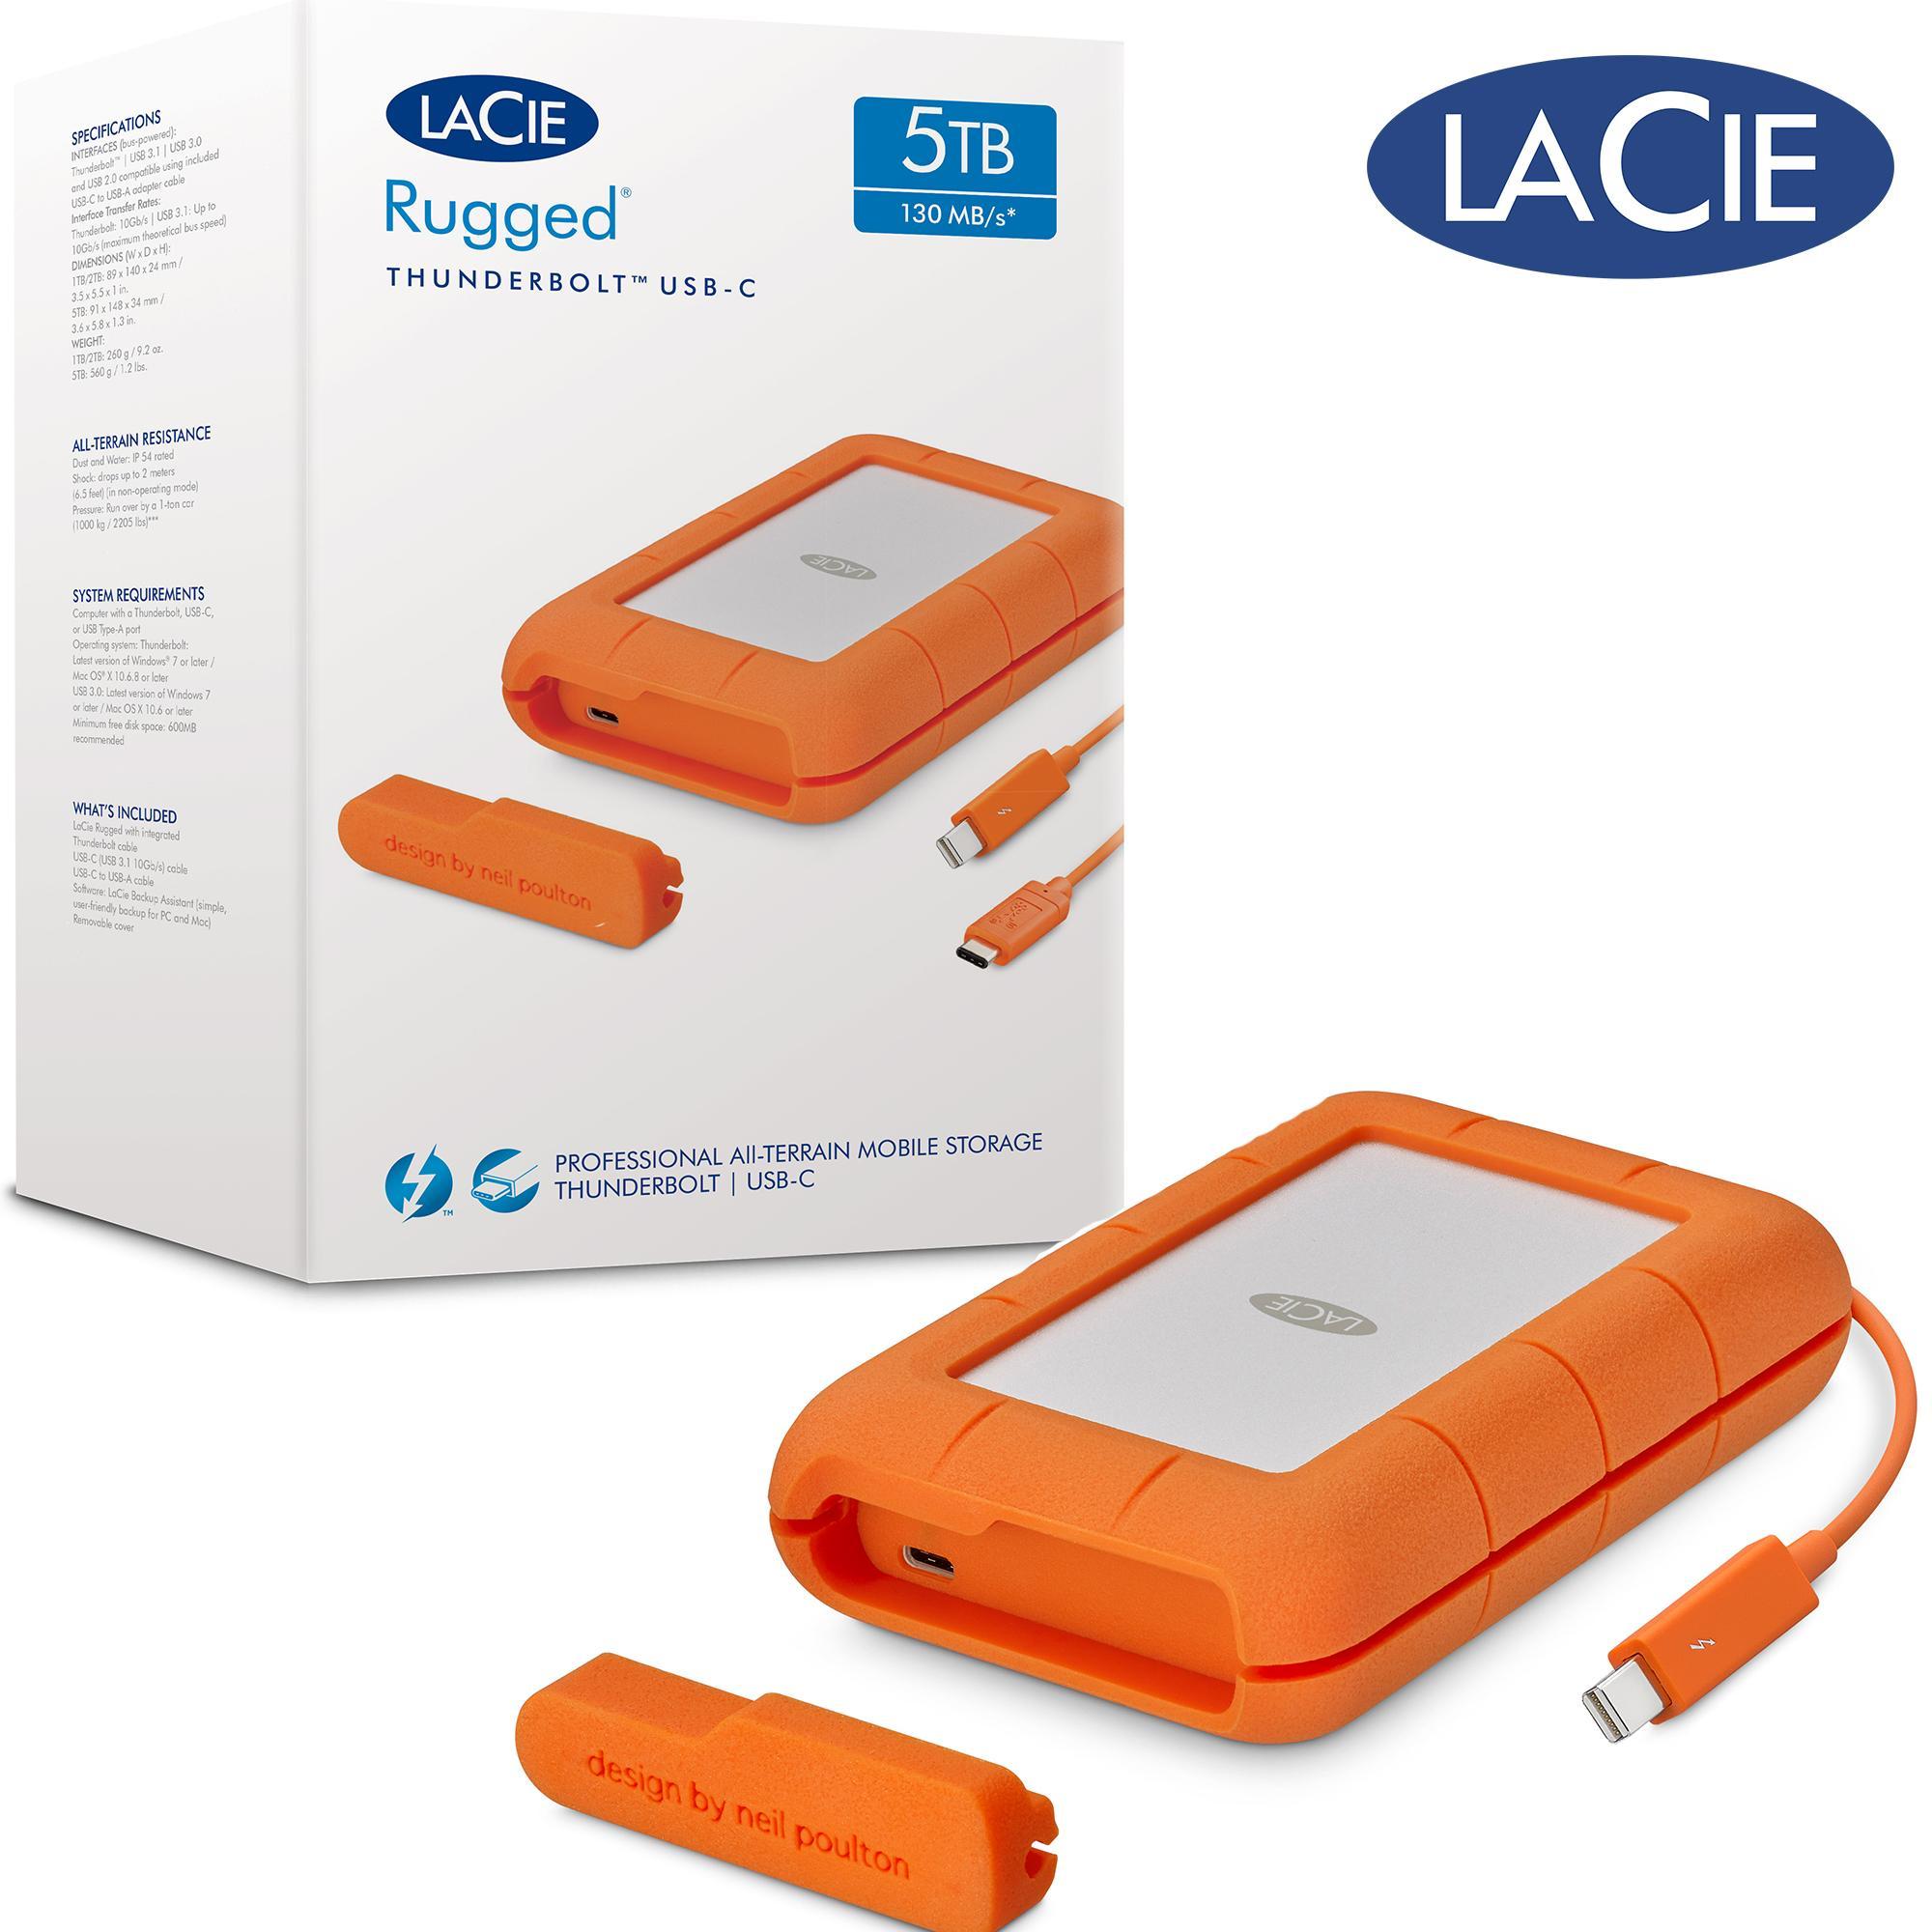 Lacie 5tb Rugged Thunderbolt Usb C Portable Hard Disk Singapore